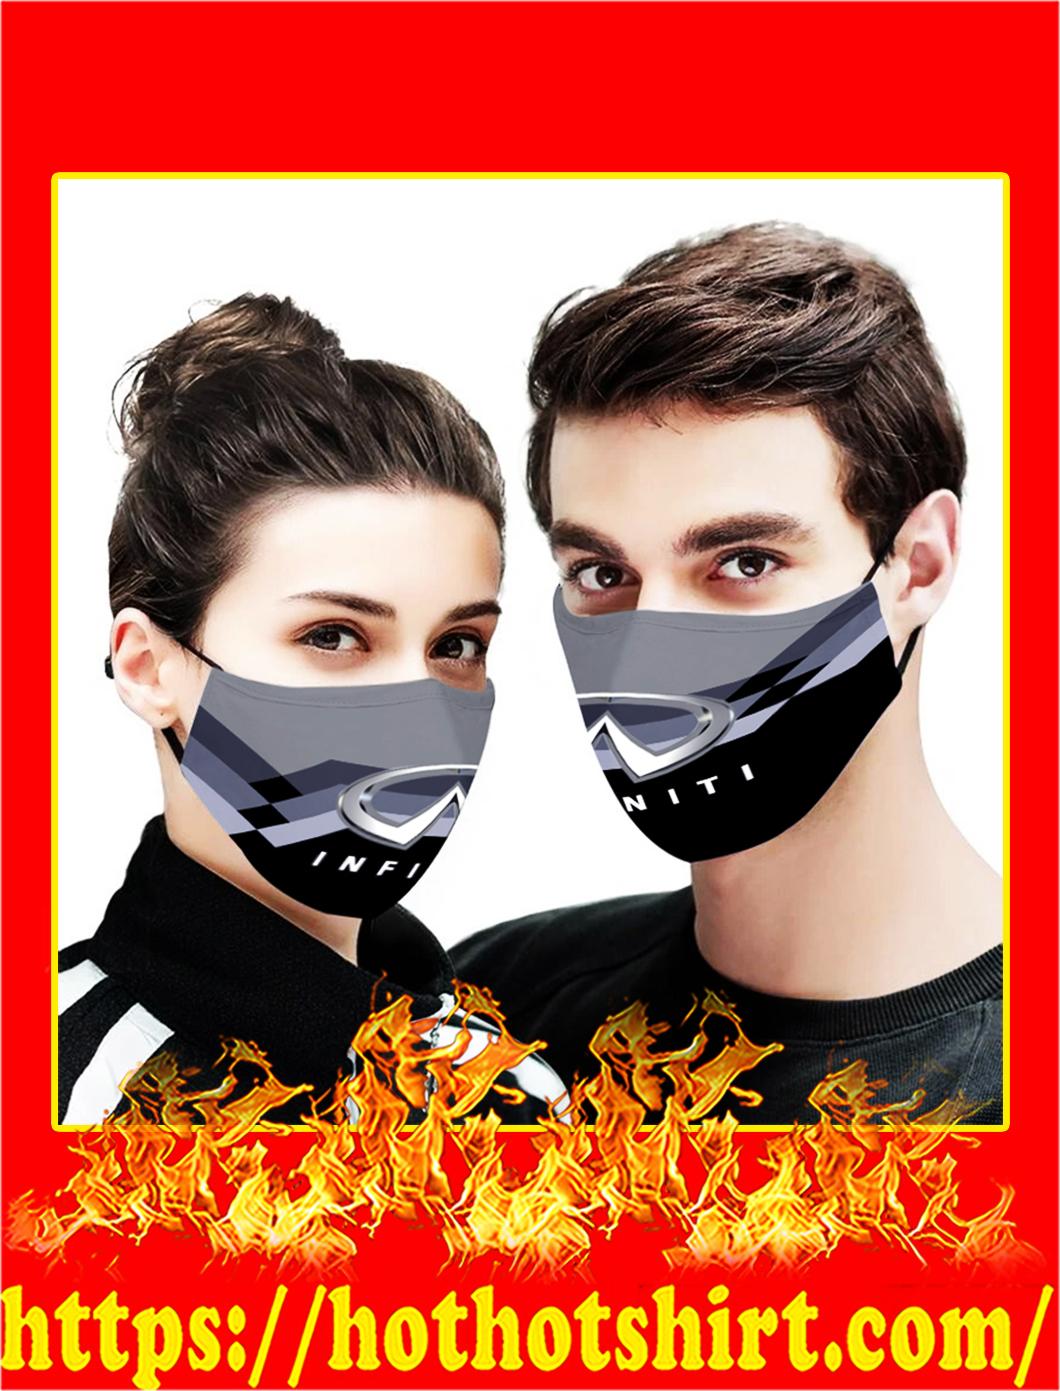 Infiniti 3d face mask- pic 1